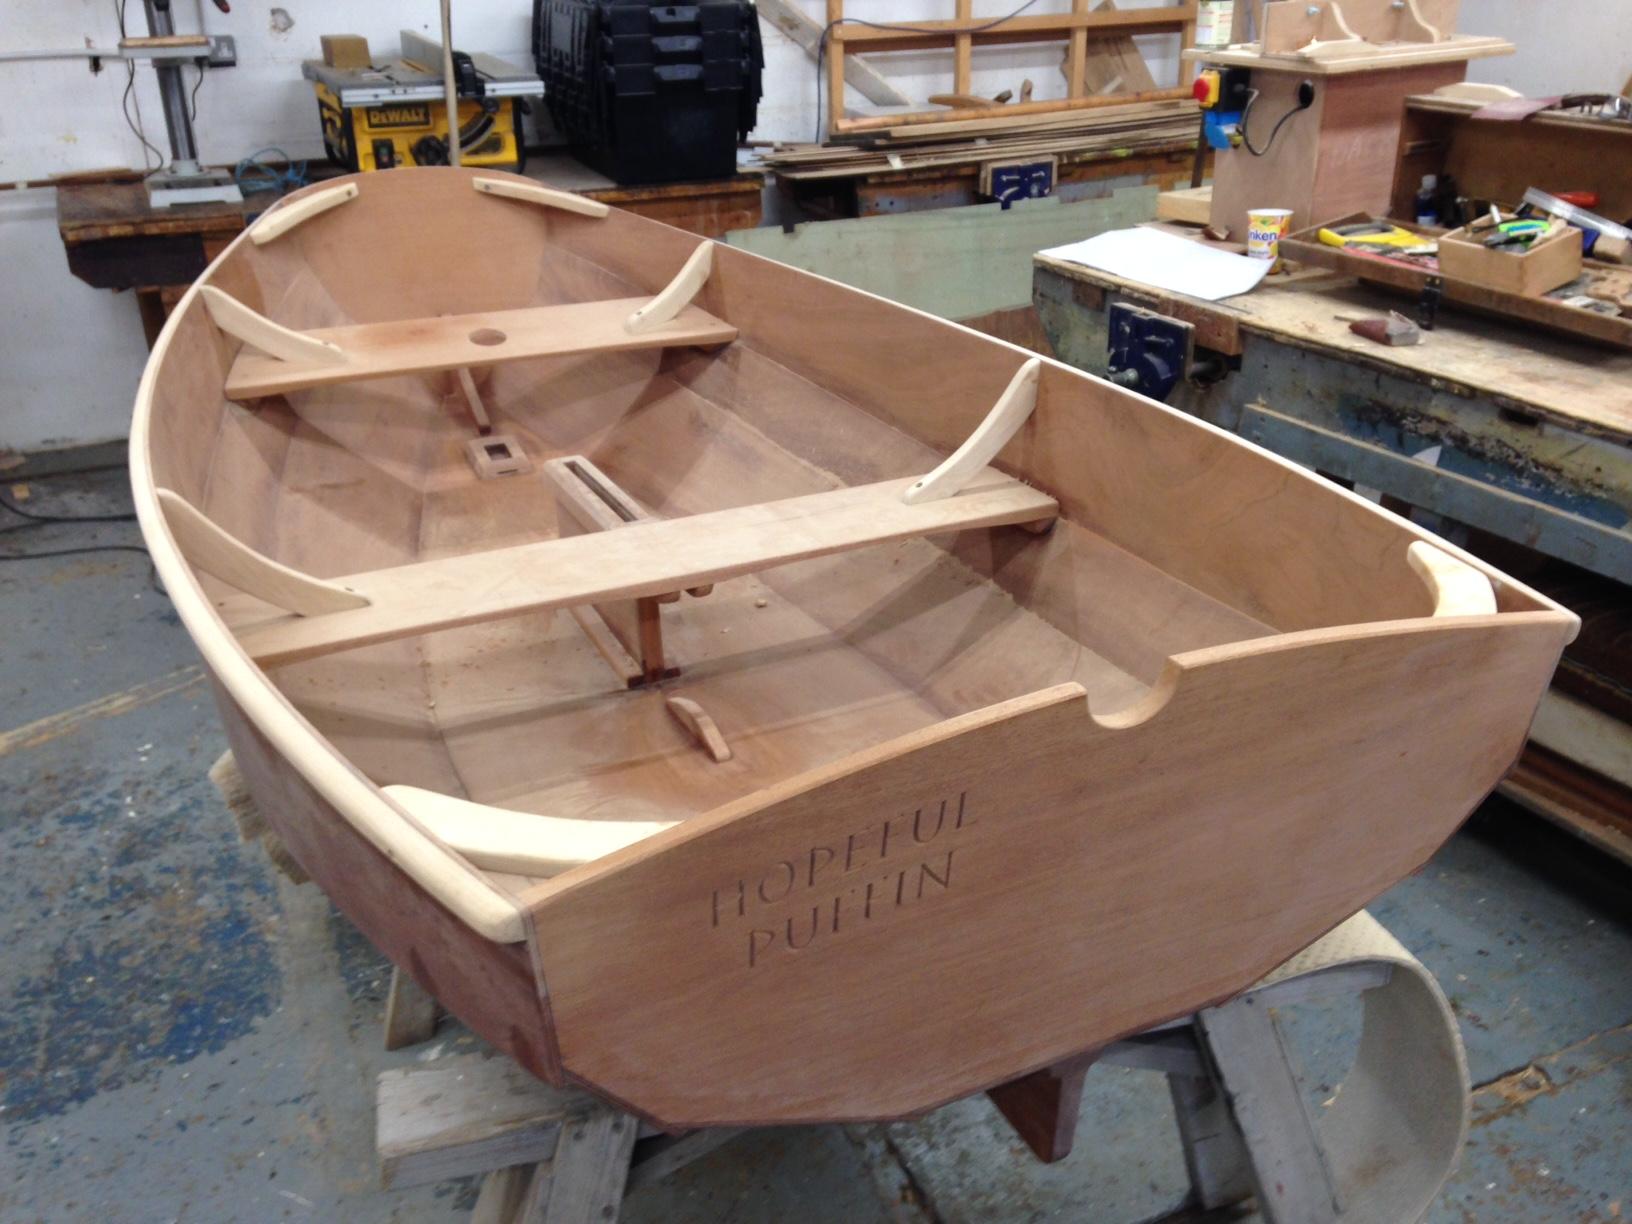 Pram Boat Plans Plywood : Hopeful puffin building a watertight pram dinghy ibtc